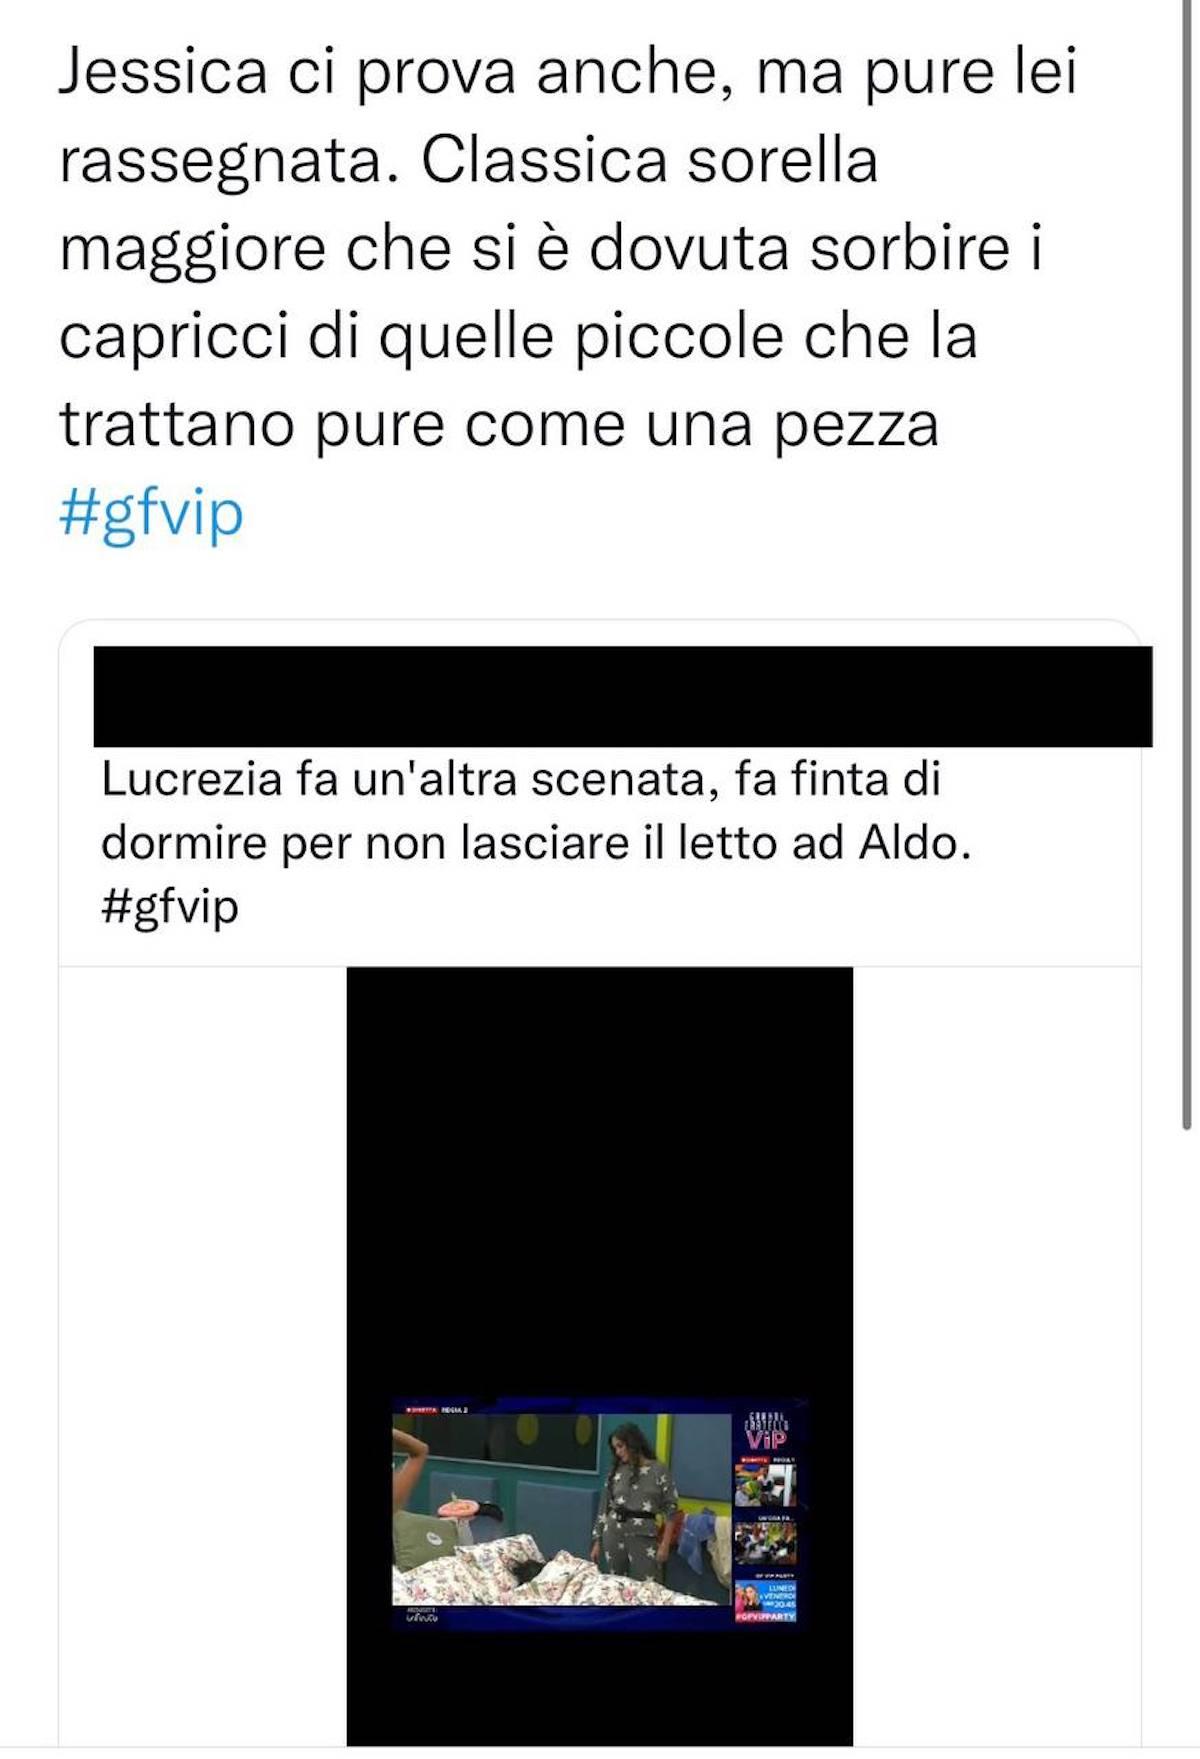 lulù selassié manuel bortuzzo notte gf vip 6